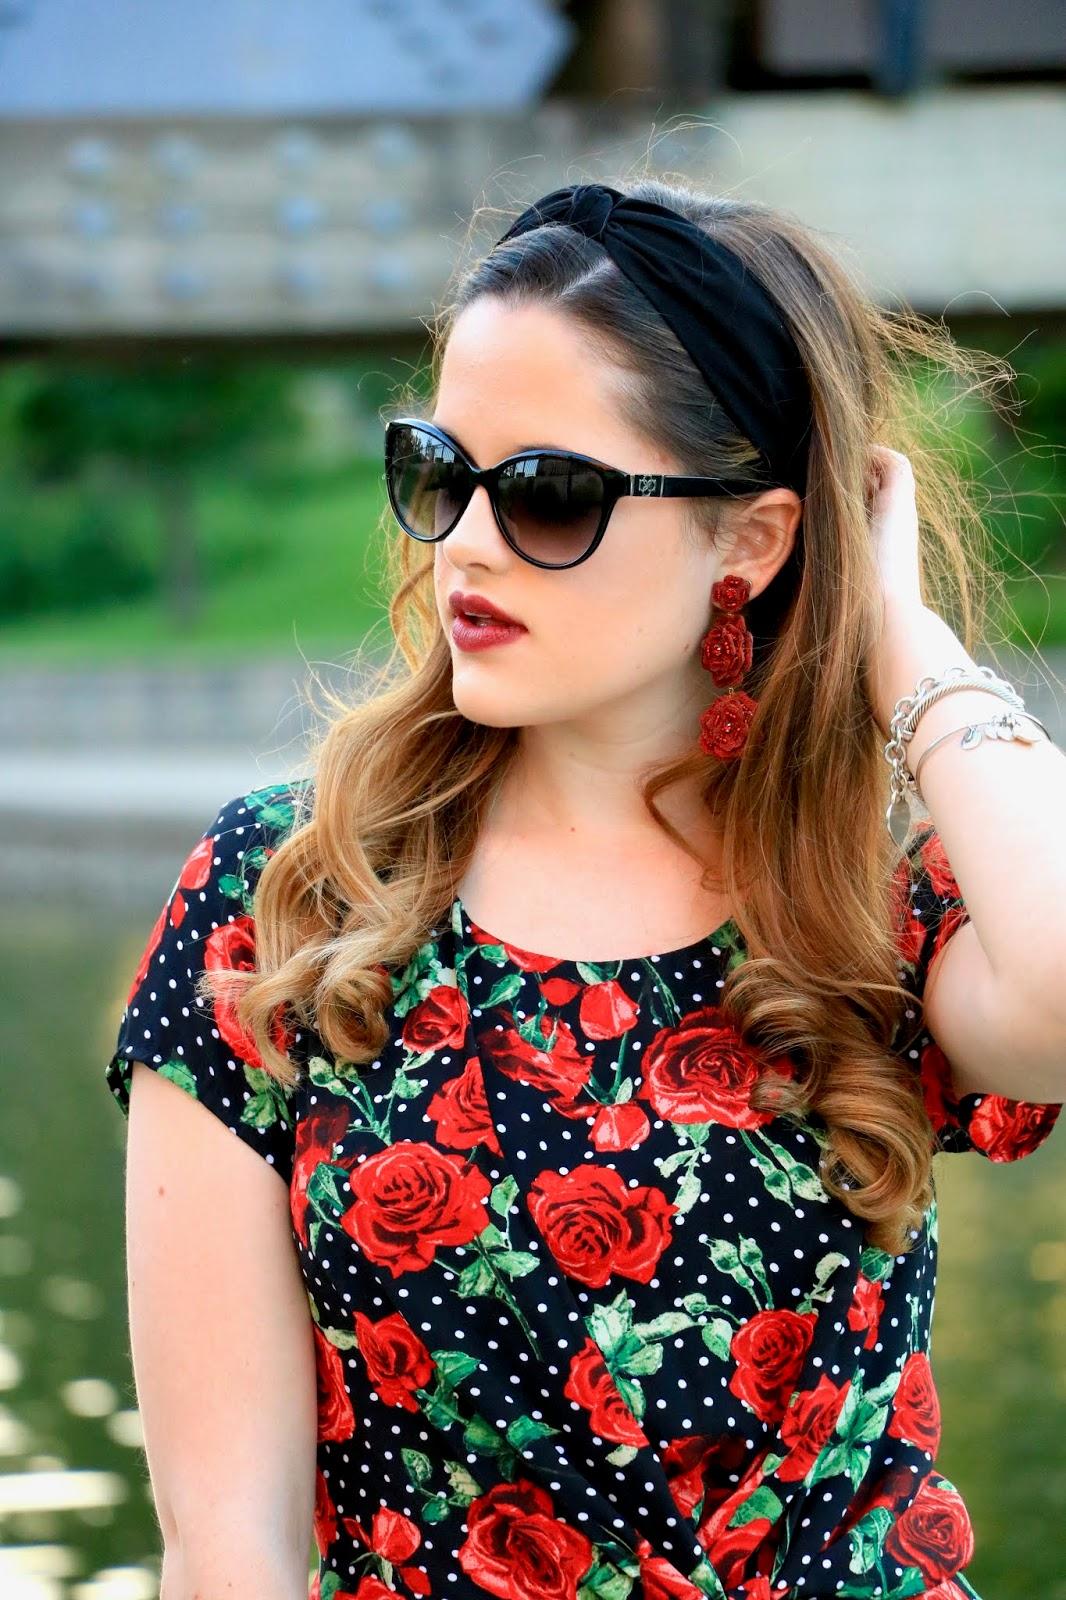 Nyc fashion blogger Kathleen Harper wearing rose statement earrings